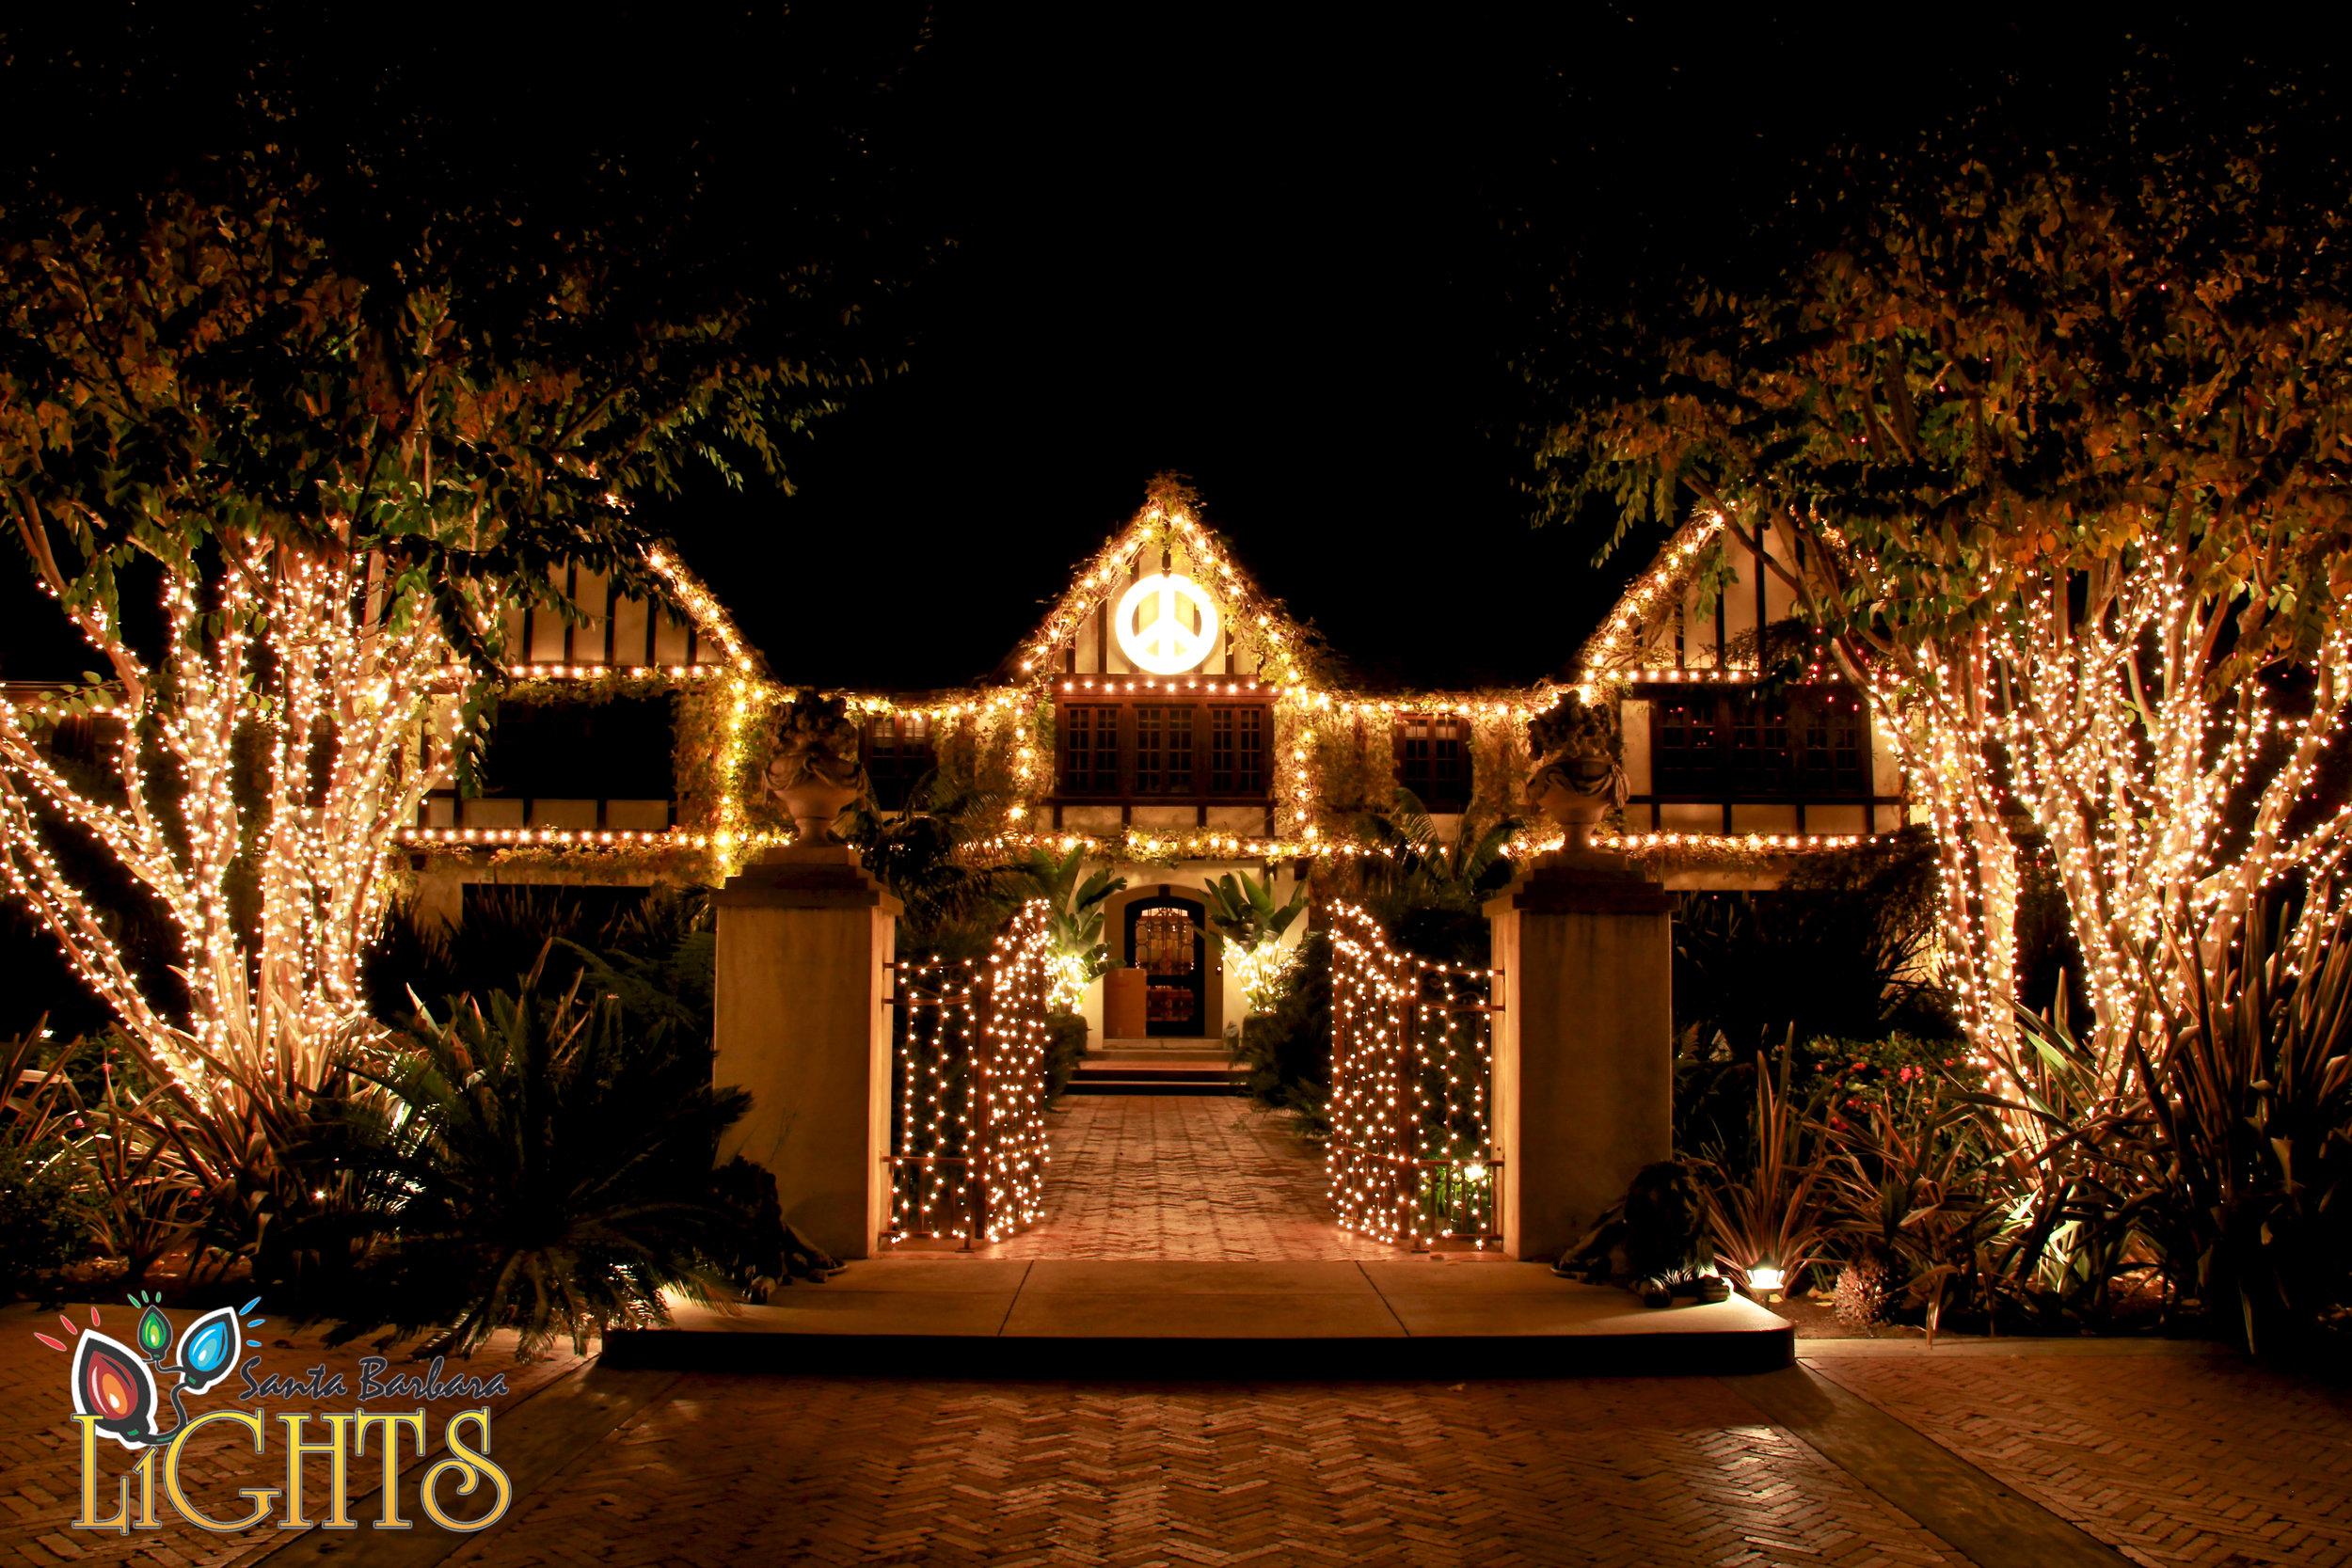 Santa Barbara Lights 2011 Season 010.jpg